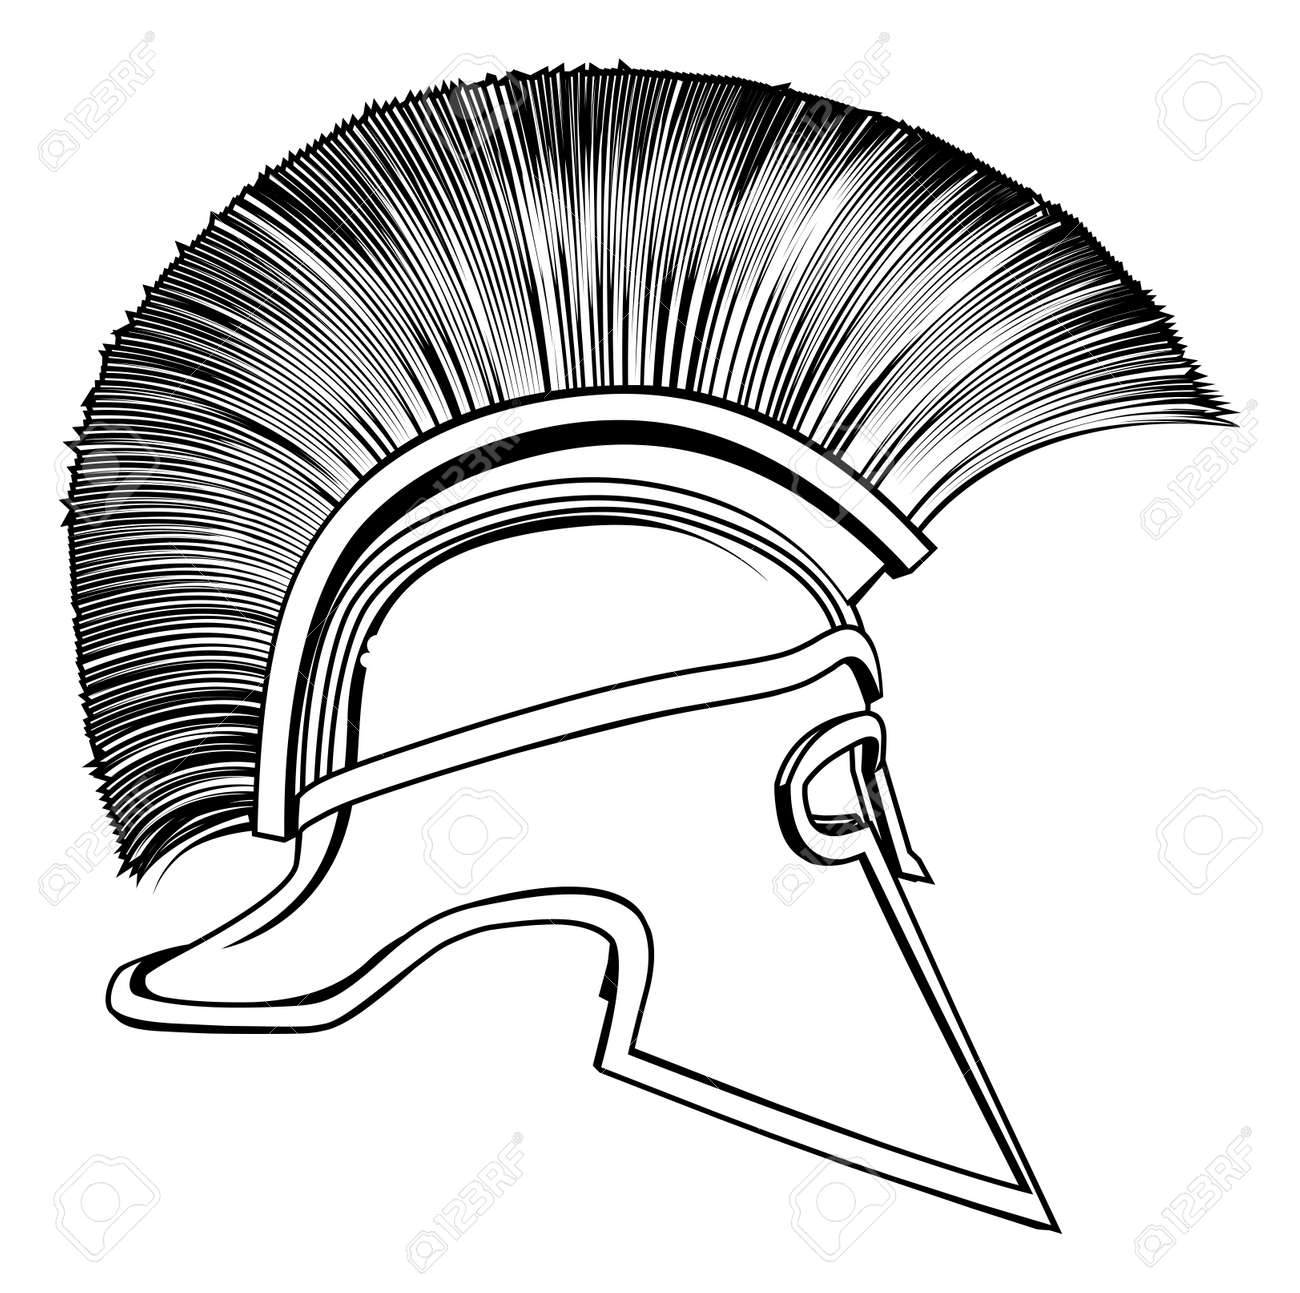 Black and white illustration of a side on ancient Greek Warrior helmet, Spartan helmet, Roman helmet or Trojan helmet. Stock Vector - 14052139